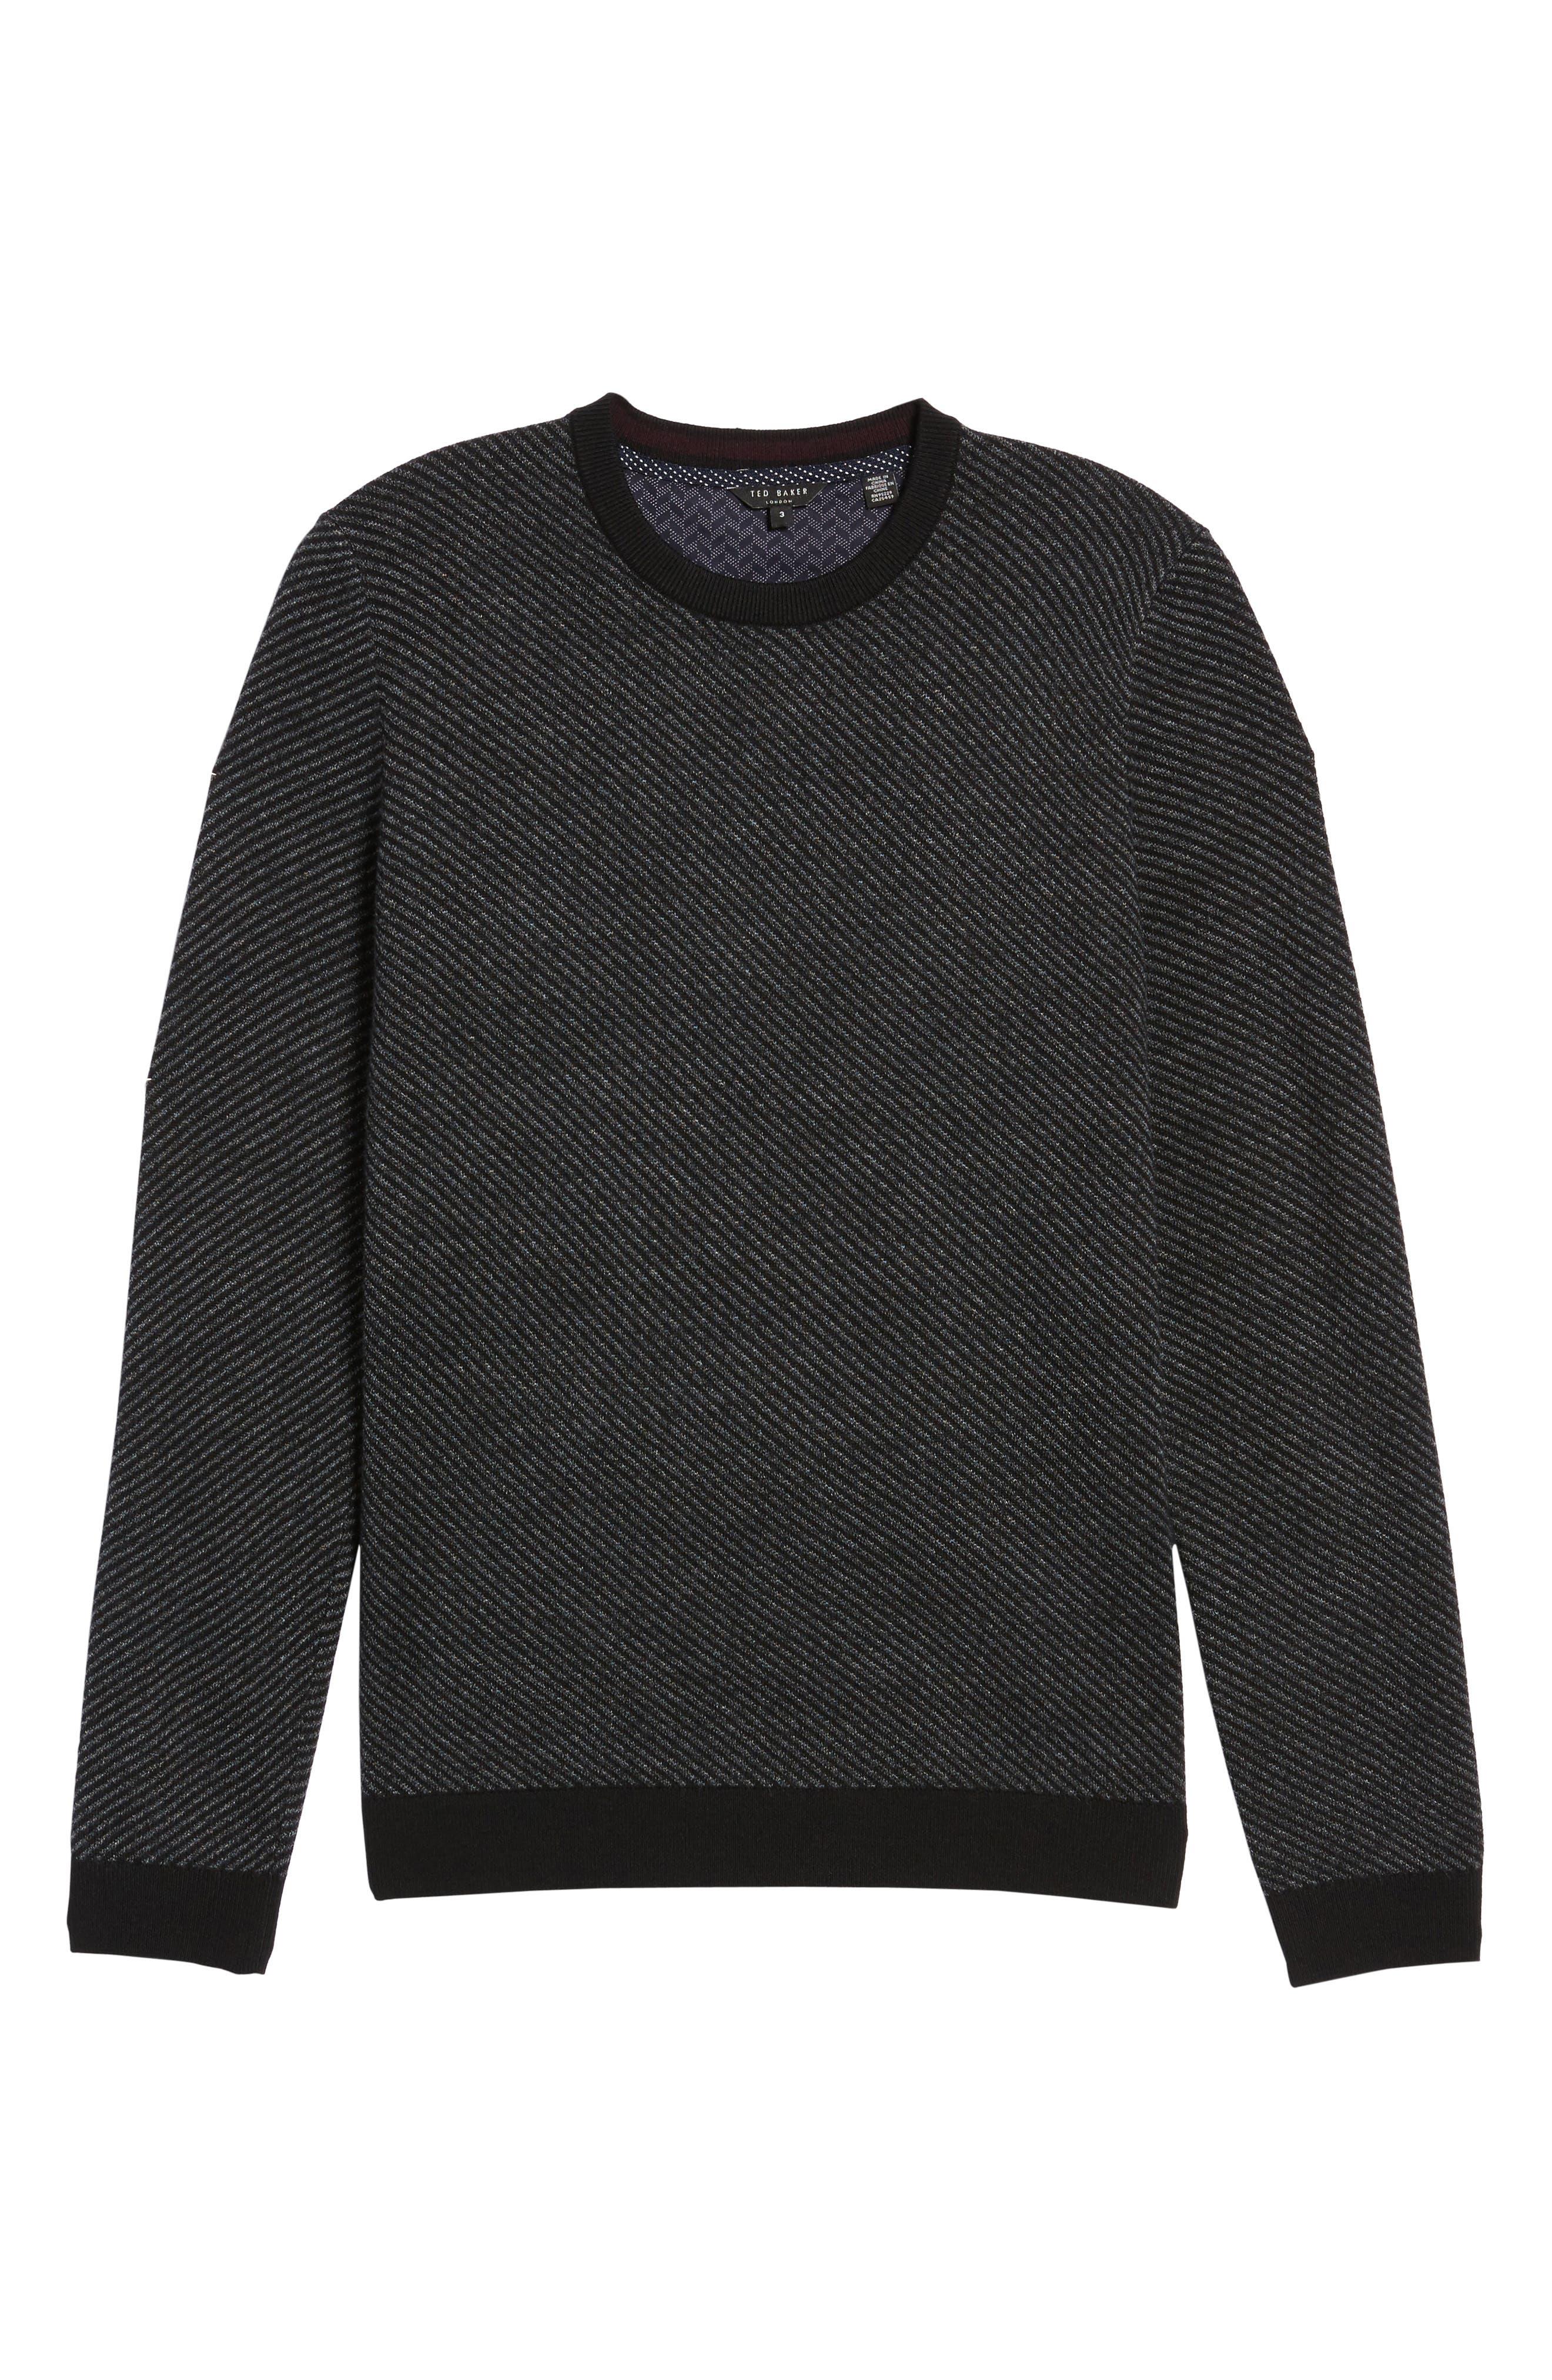 Cinamon Interest Stitch Crewneck Sweater,                             Alternate thumbnail 6, color,                             001